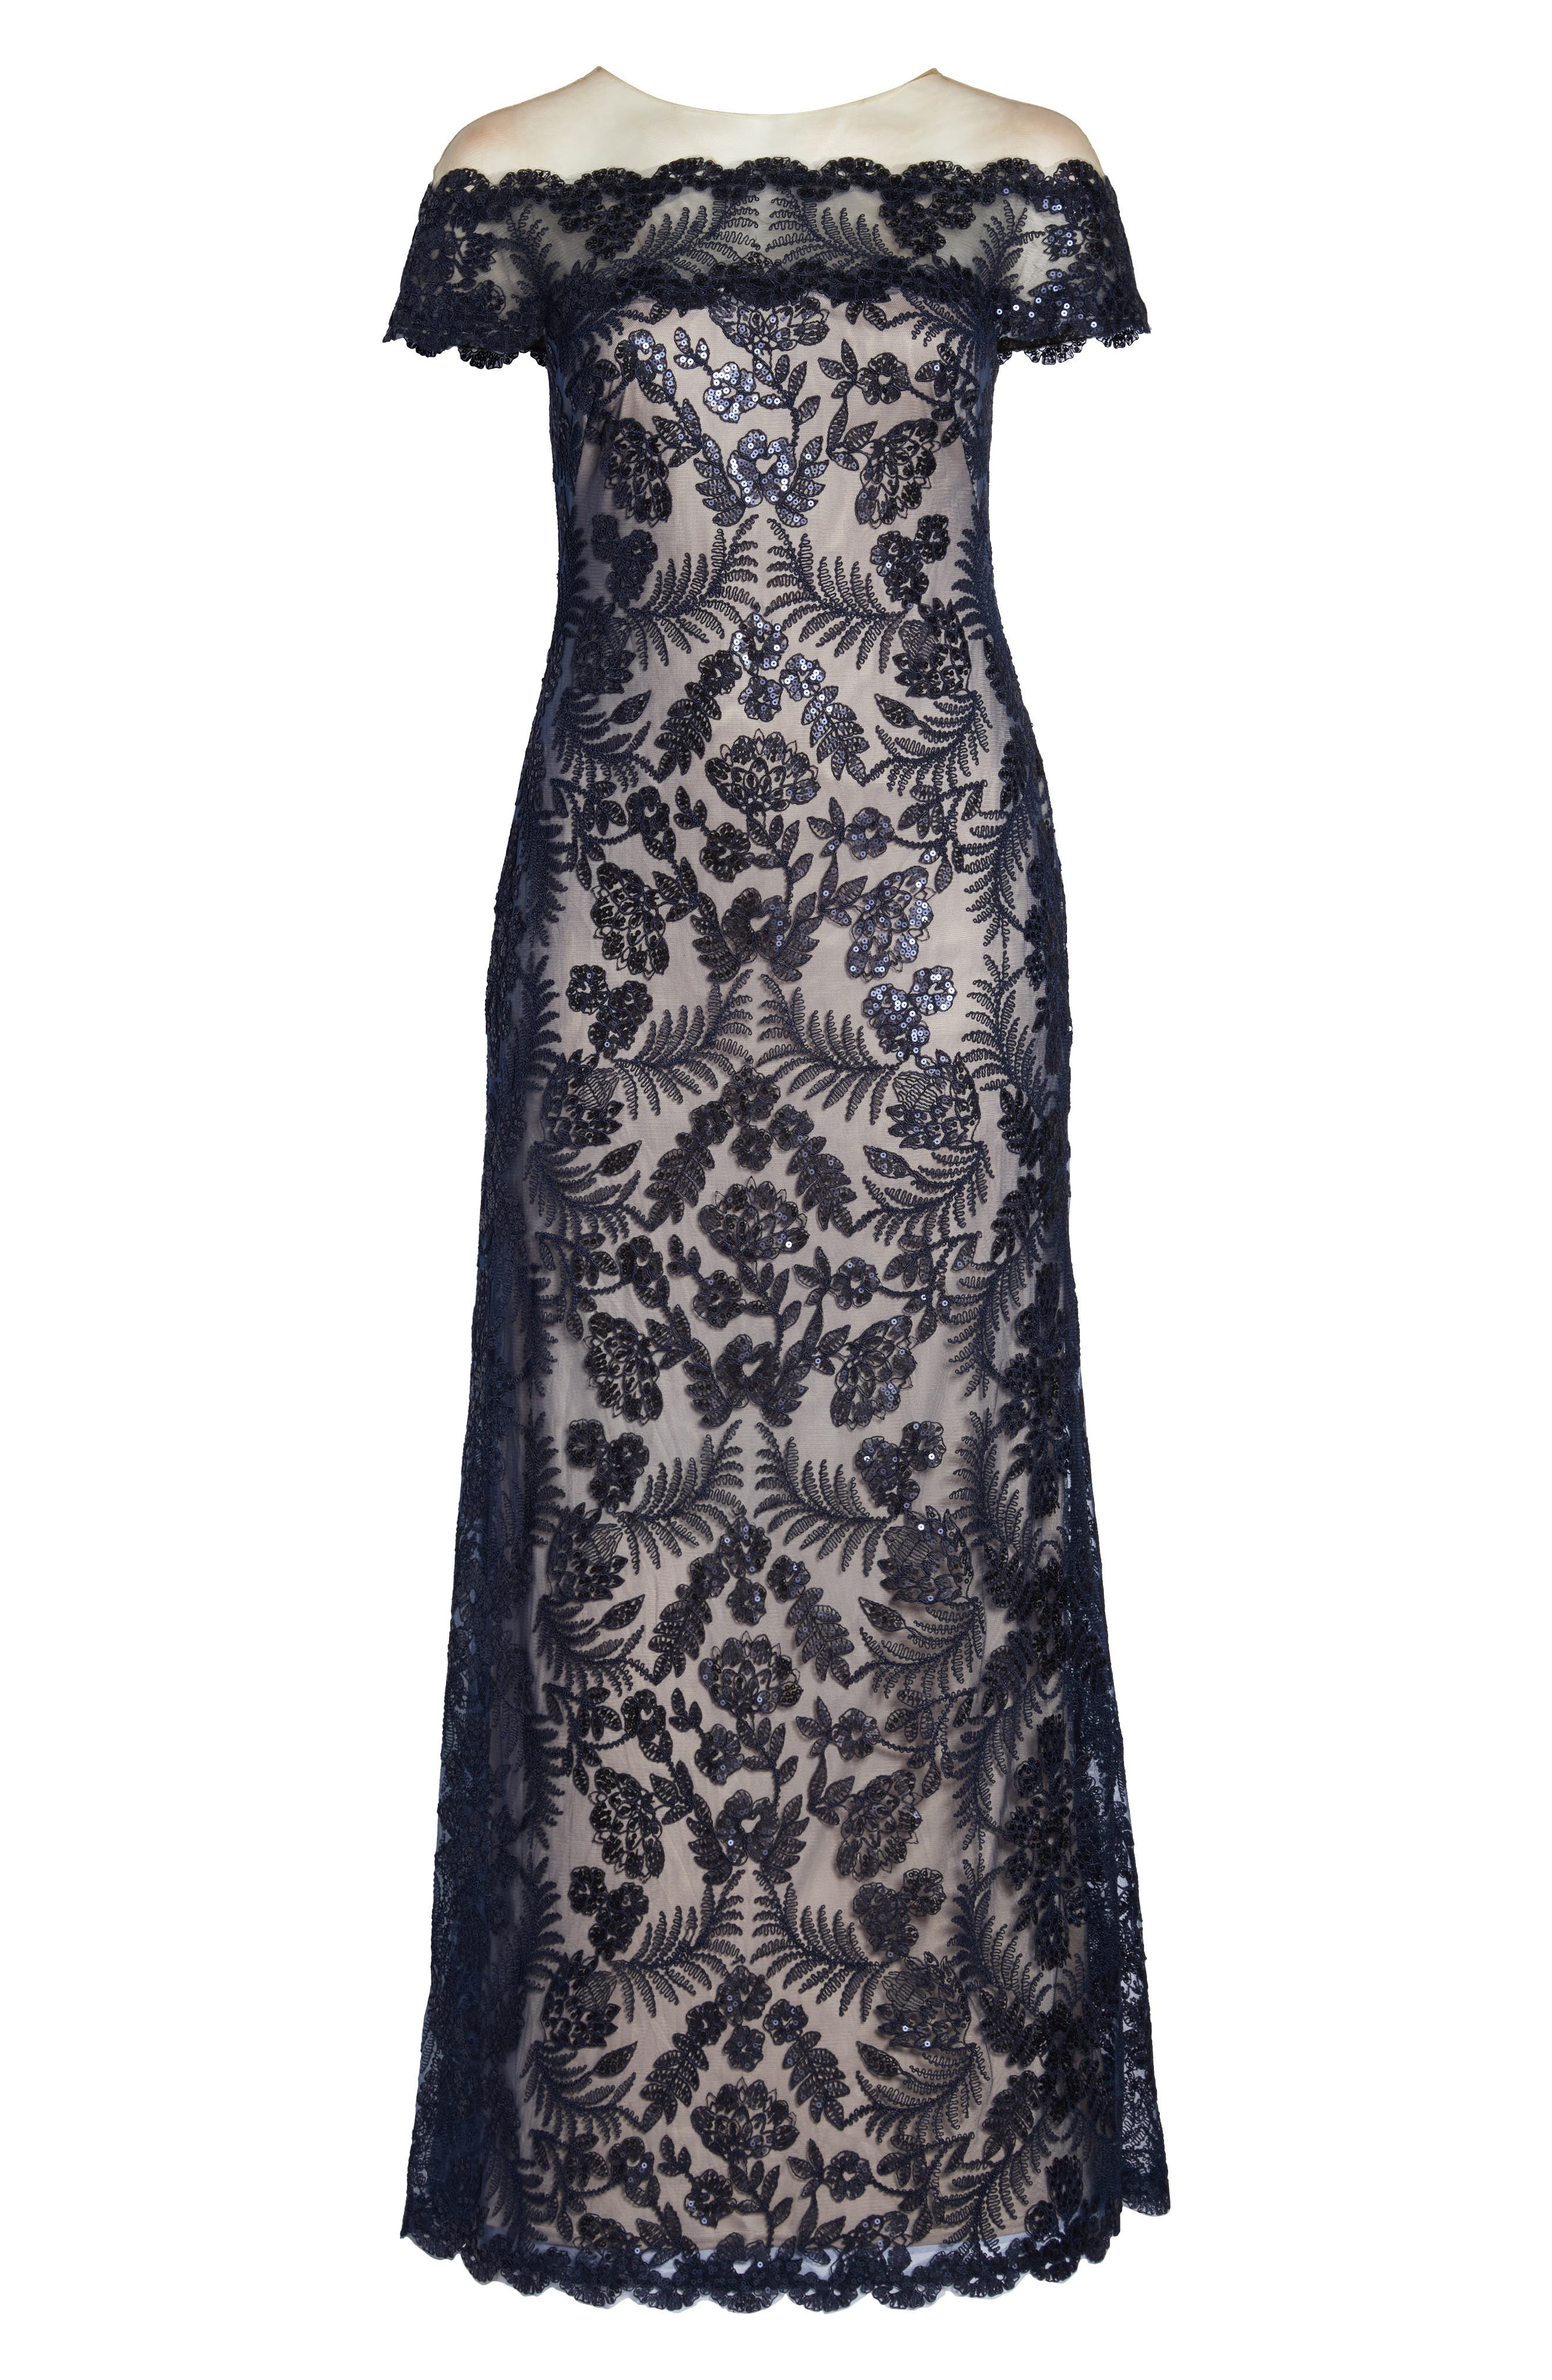 TADASHI SHOJI, Illusion Neck Sequin Lace Gown, Alternate thumbnail 13, color, 410